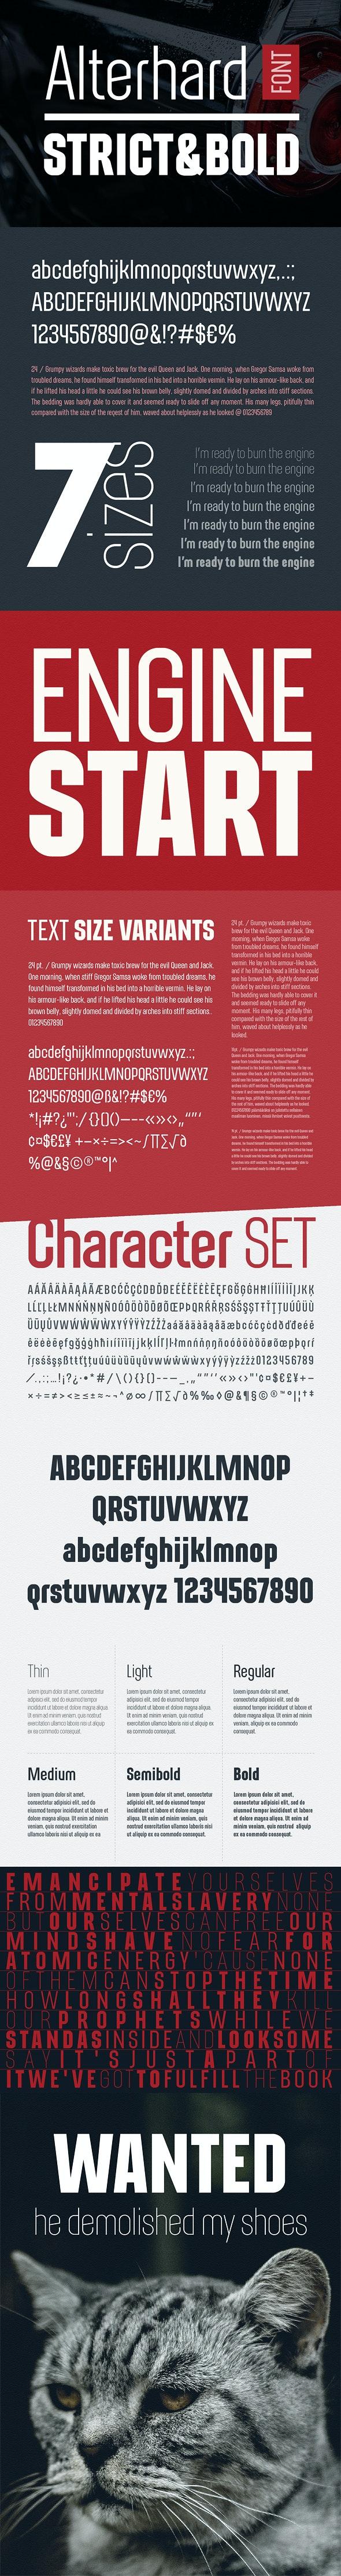 Alterhard Condensed Strict Font - Condensed Sans-Serif